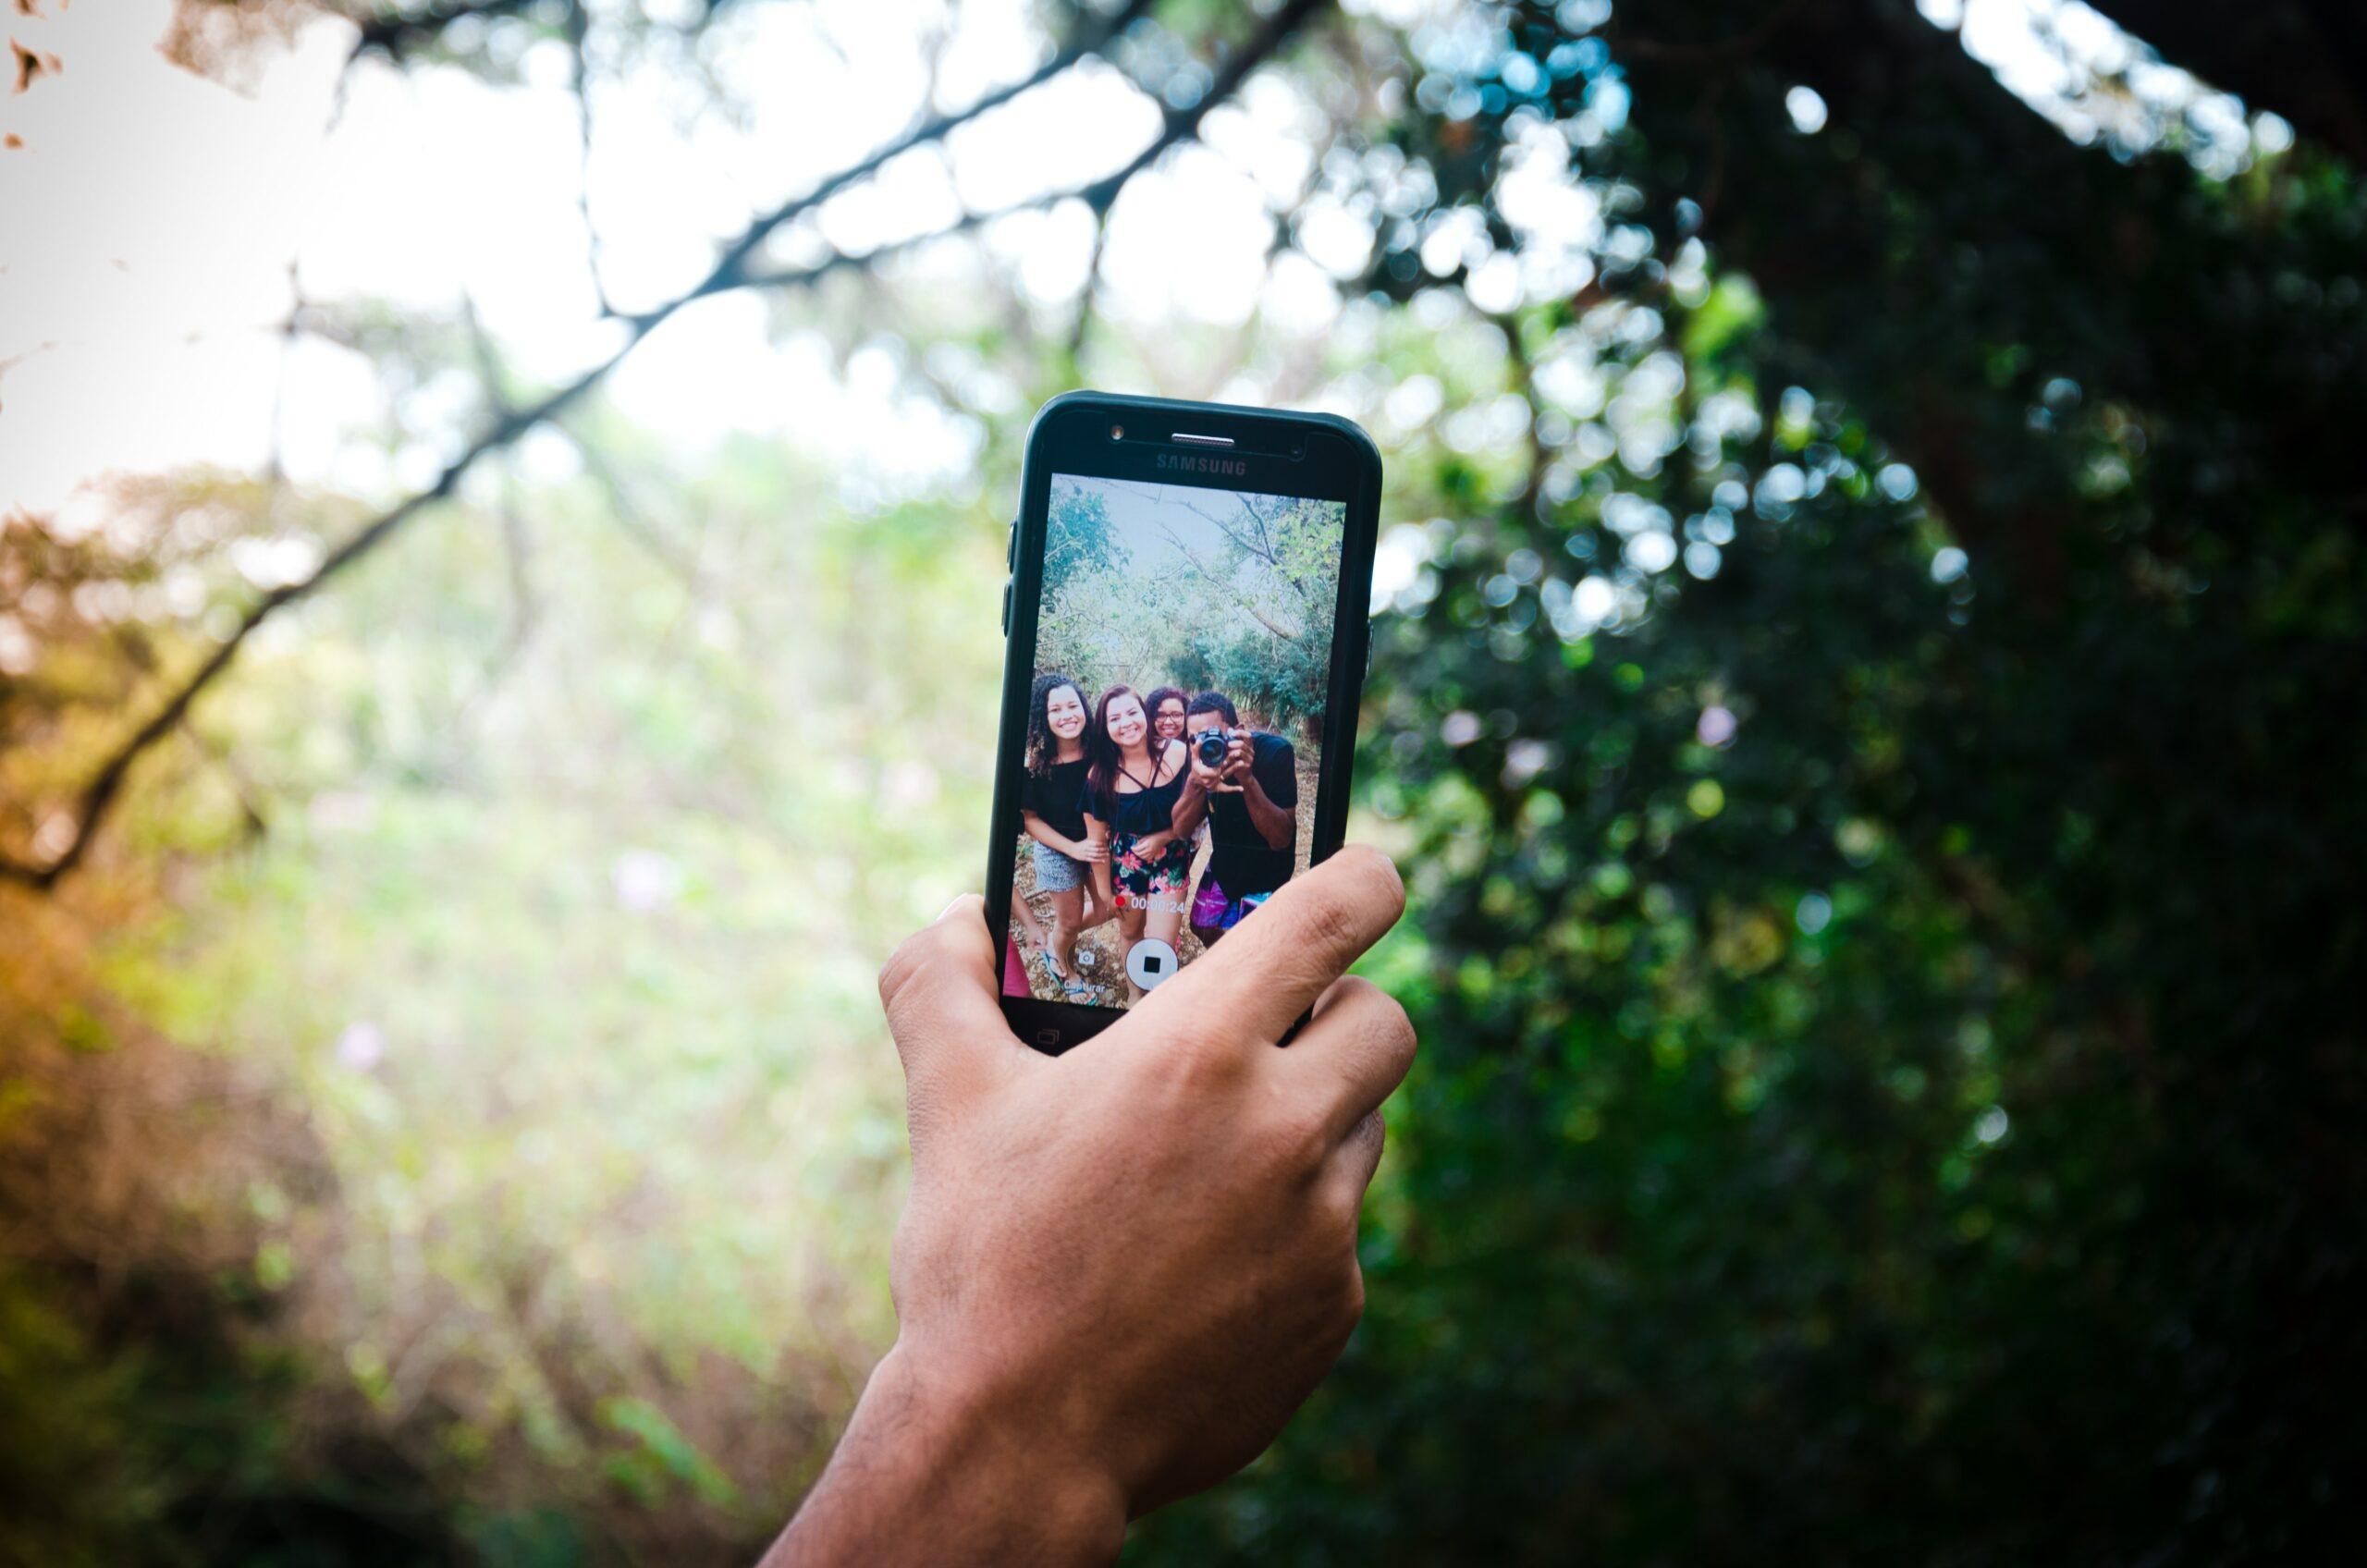 Lommel Leeft Fotowedstrijd_Agenda_Toerisme Lommel_Zien en doen_Zomer_Activiteiten